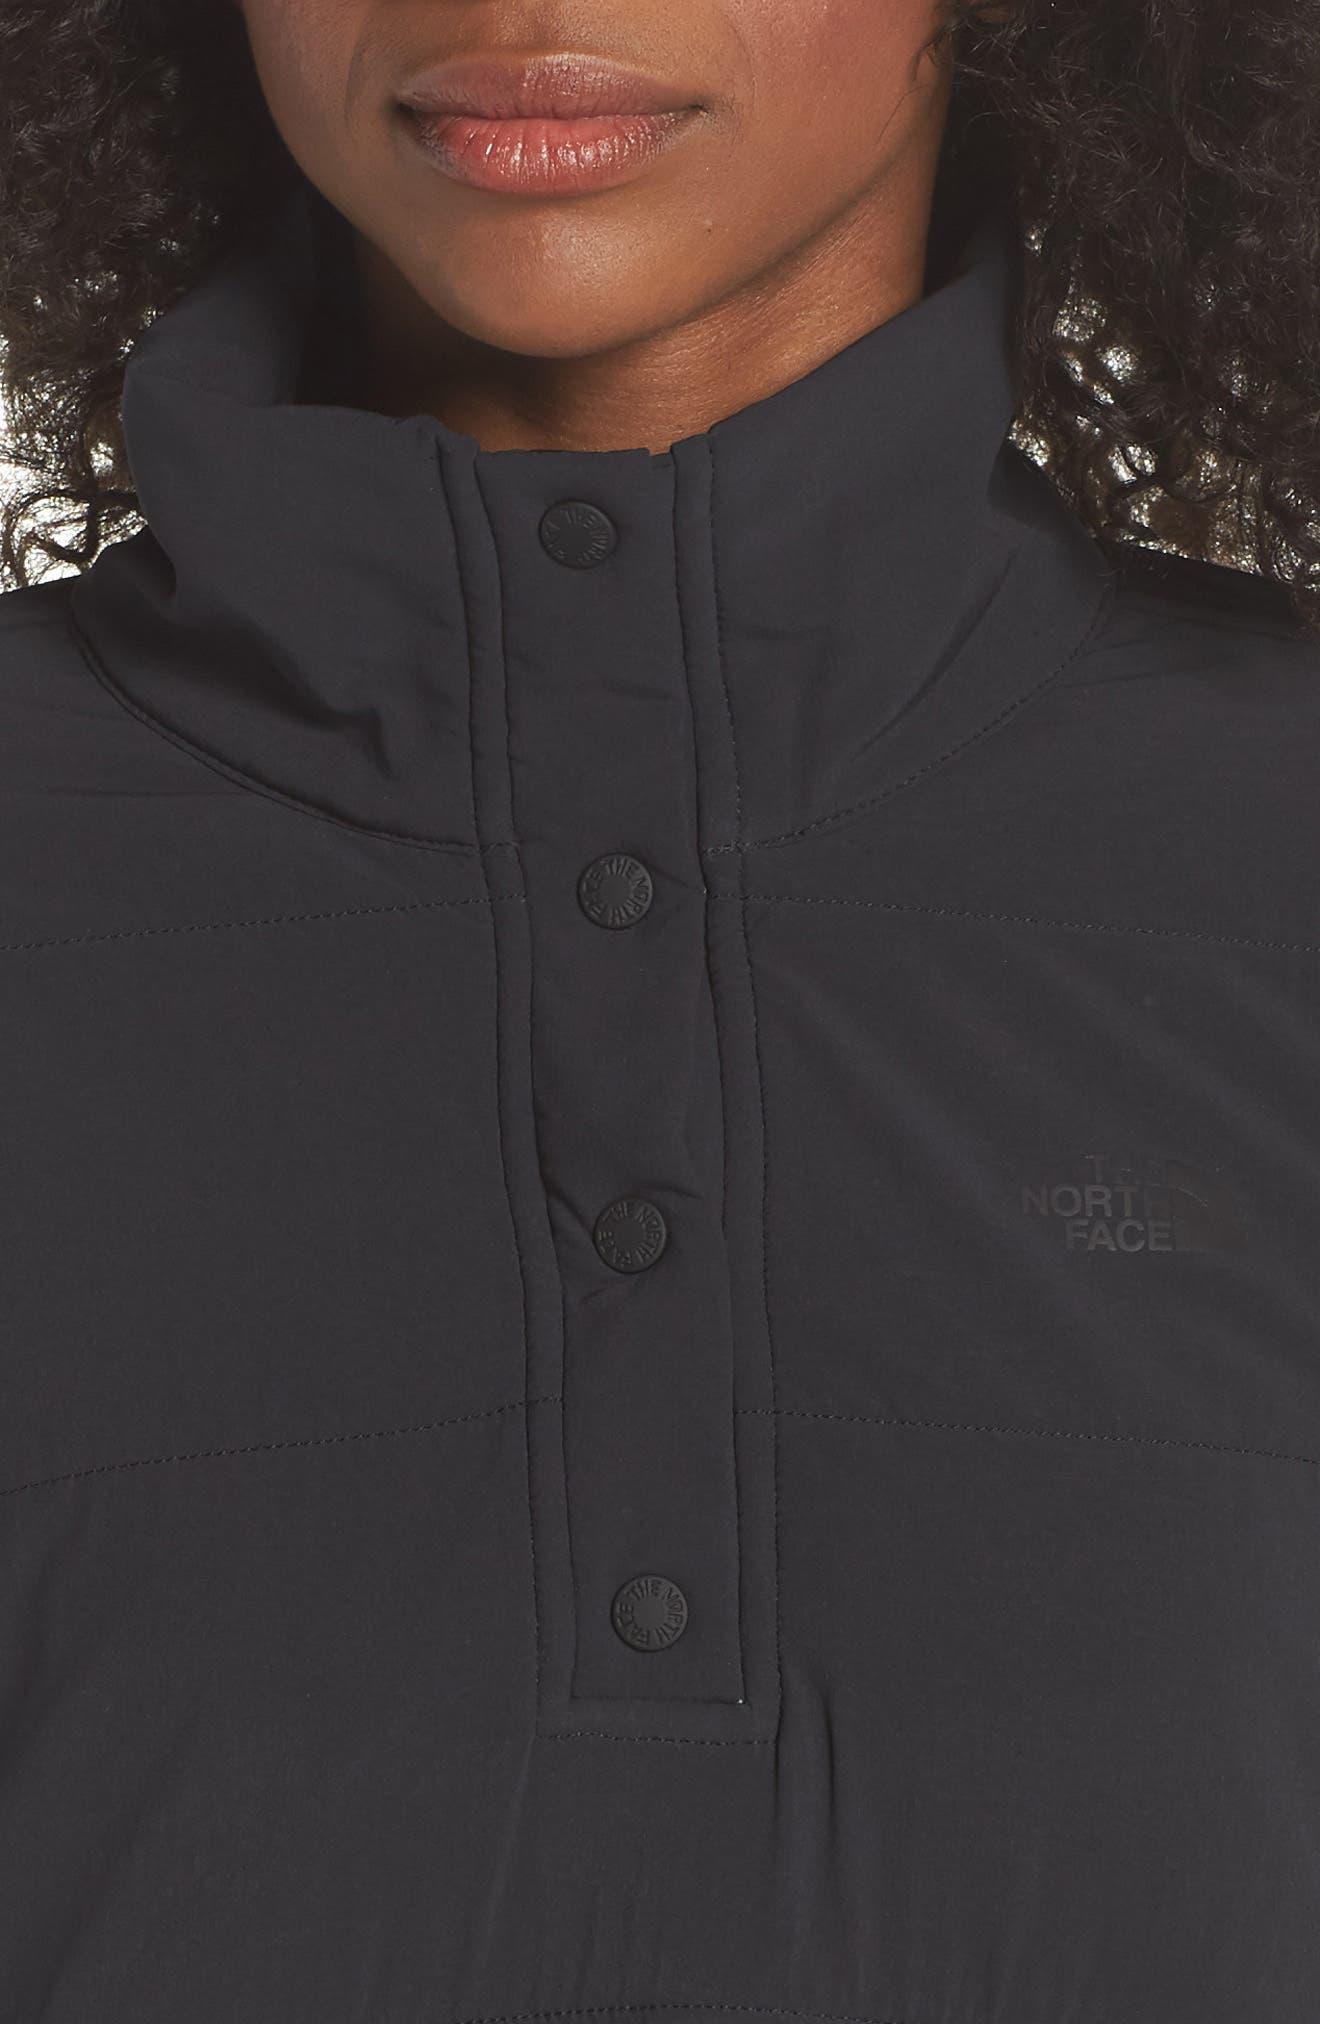 Mountain Snap Neck Sweatshirt,                             Alternate thumbnail 4, color,                             001